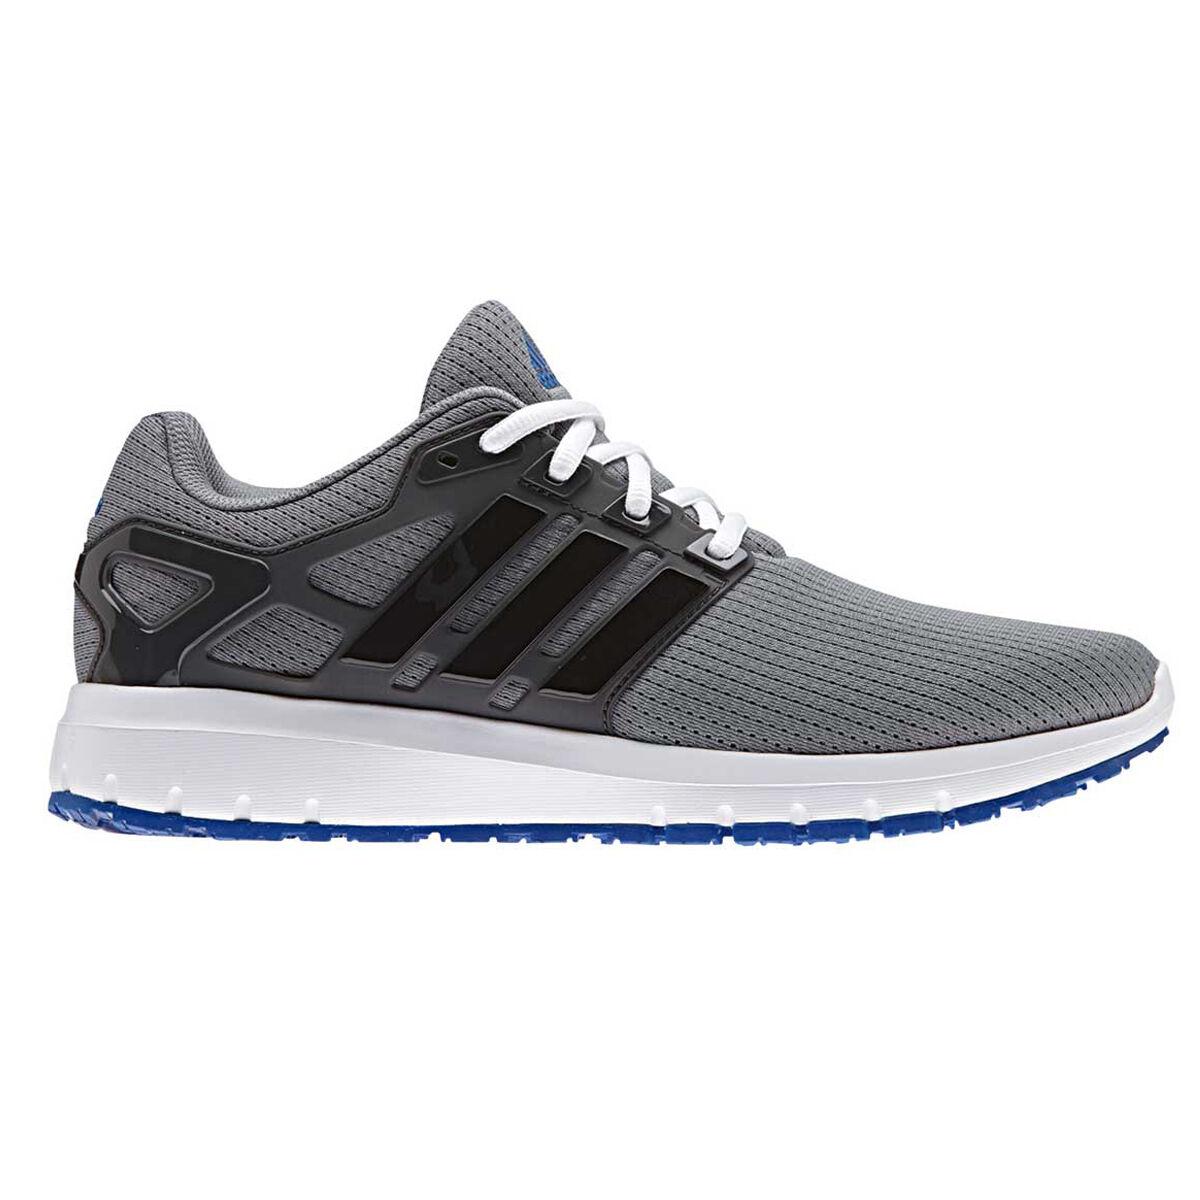 meet 7fe87 d9f9b Svart Us Mens Cloud Sport Adidas Shoes Rebel Energy Running 9 Grå Y4nO6qw